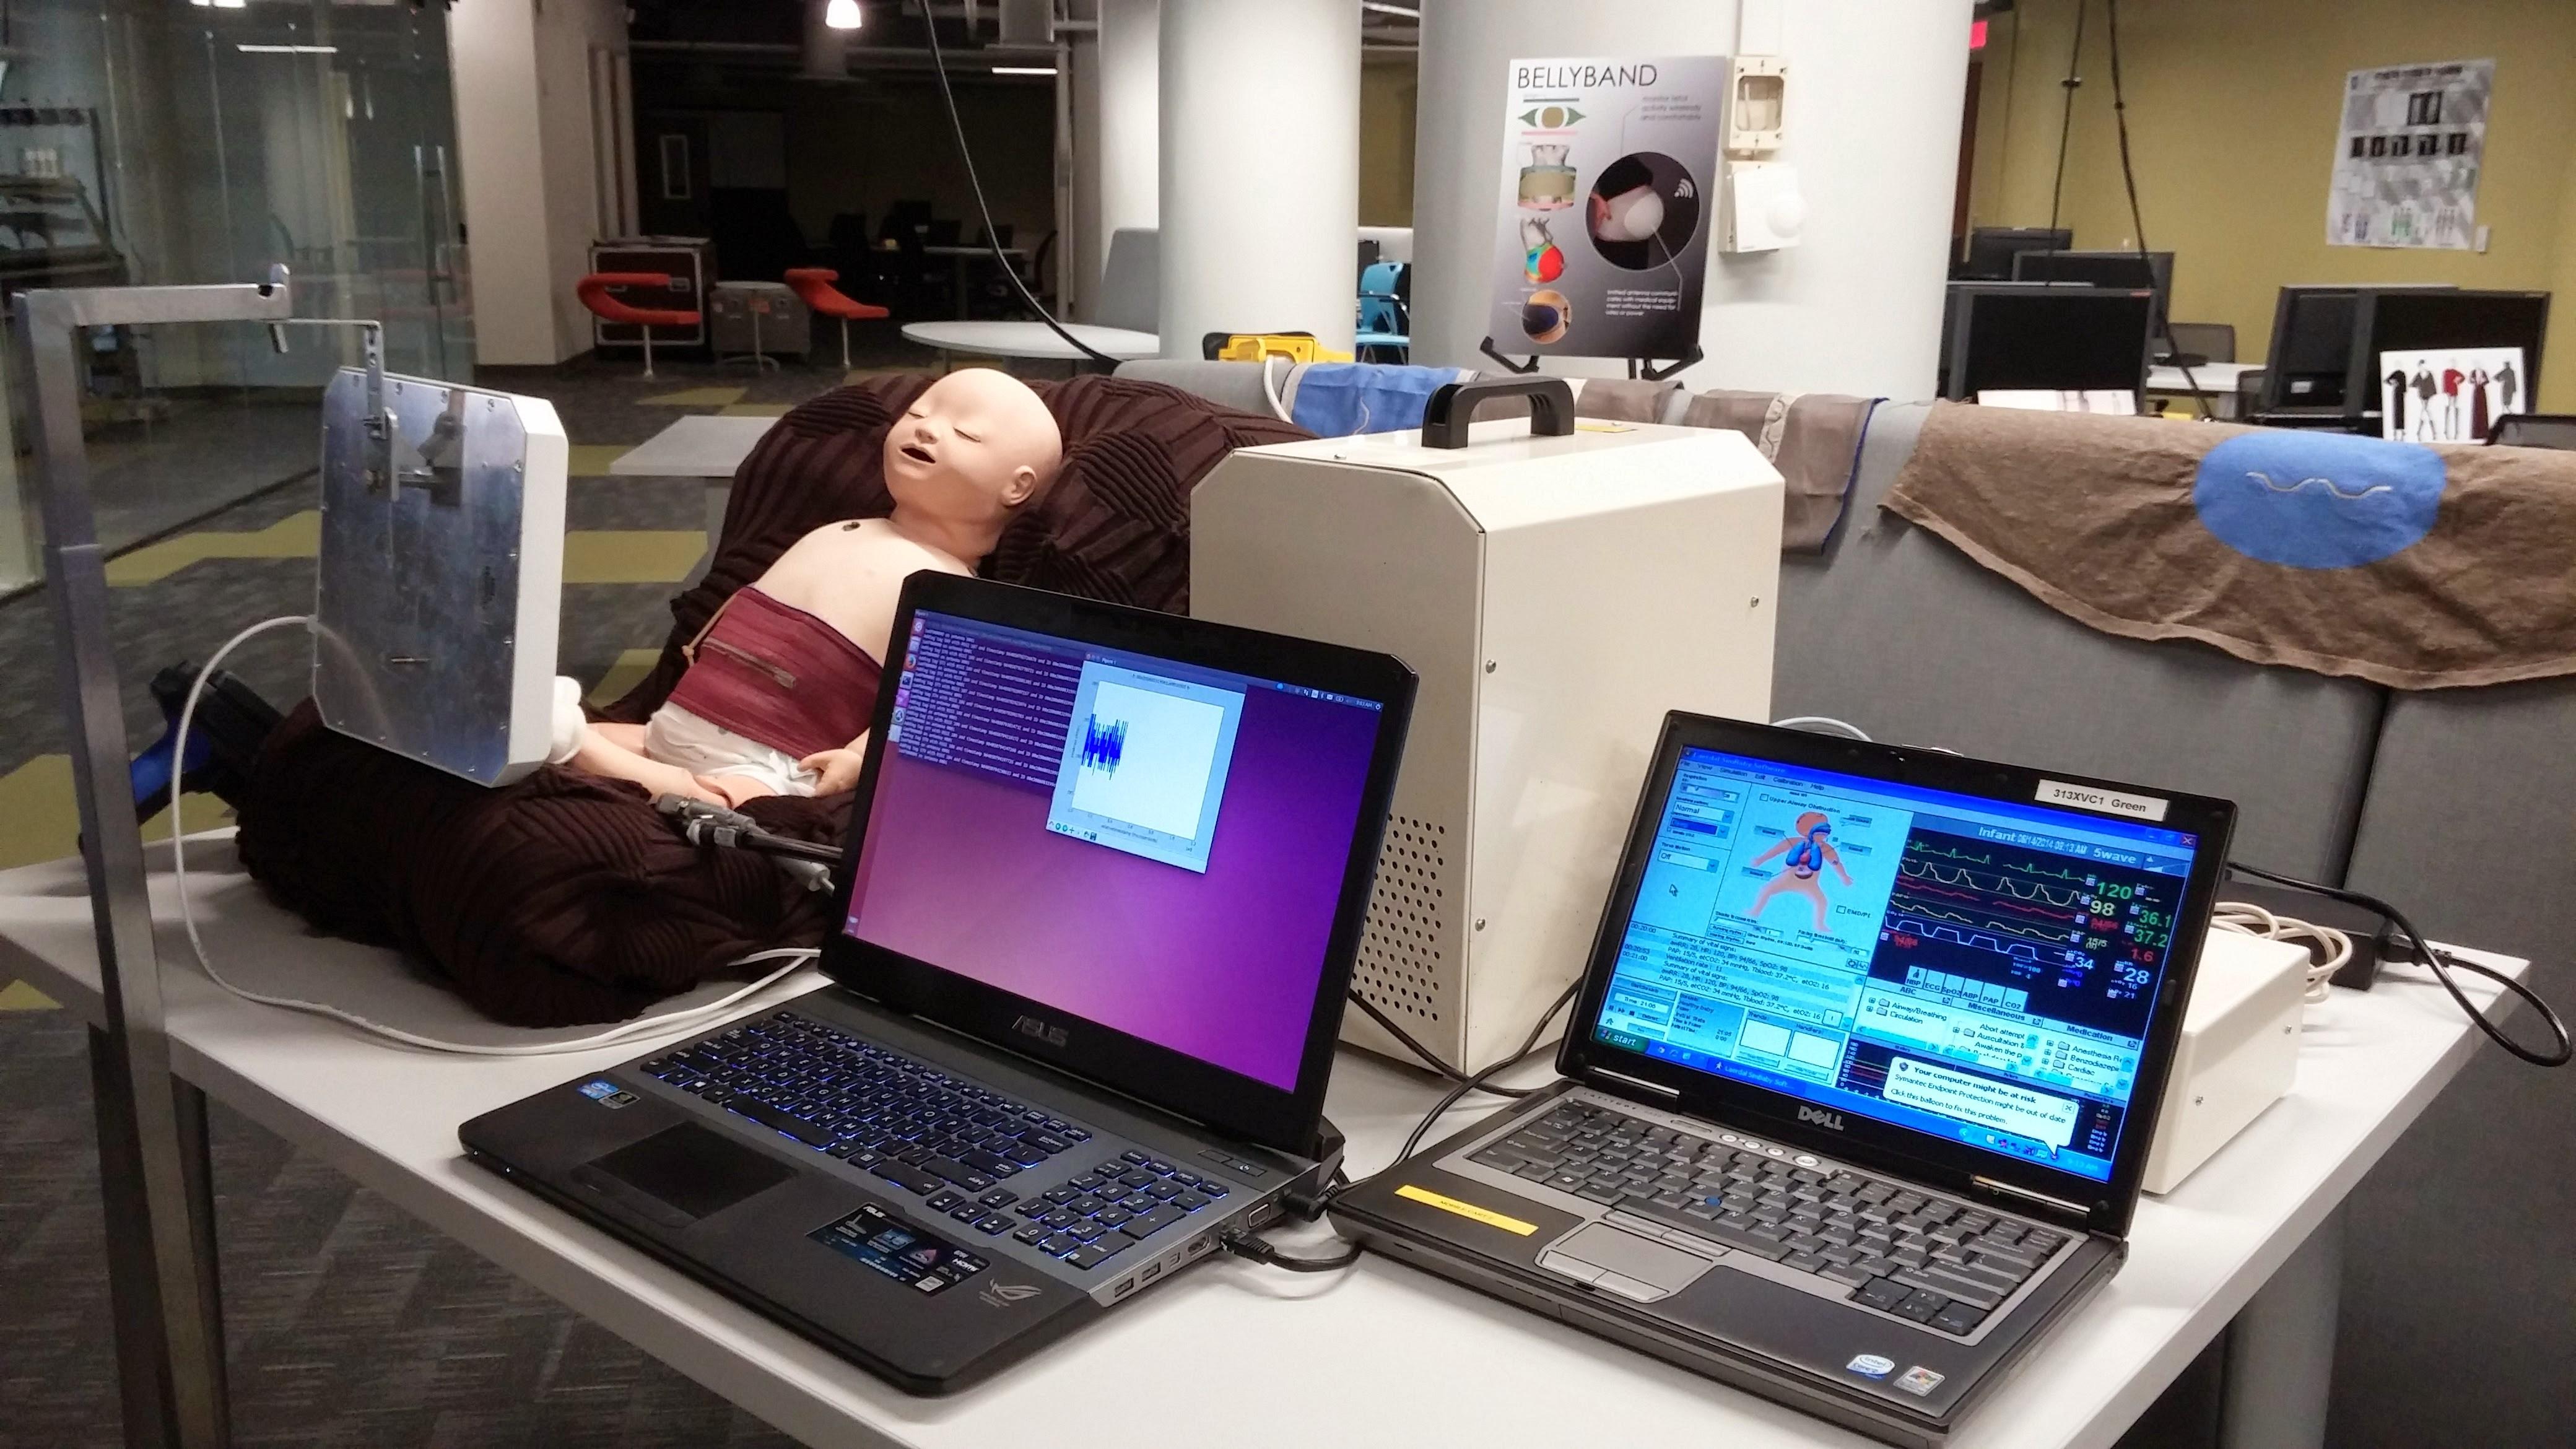 SimBaby Wireless Respiratory Analysis with the Smart Fabric Bellyband